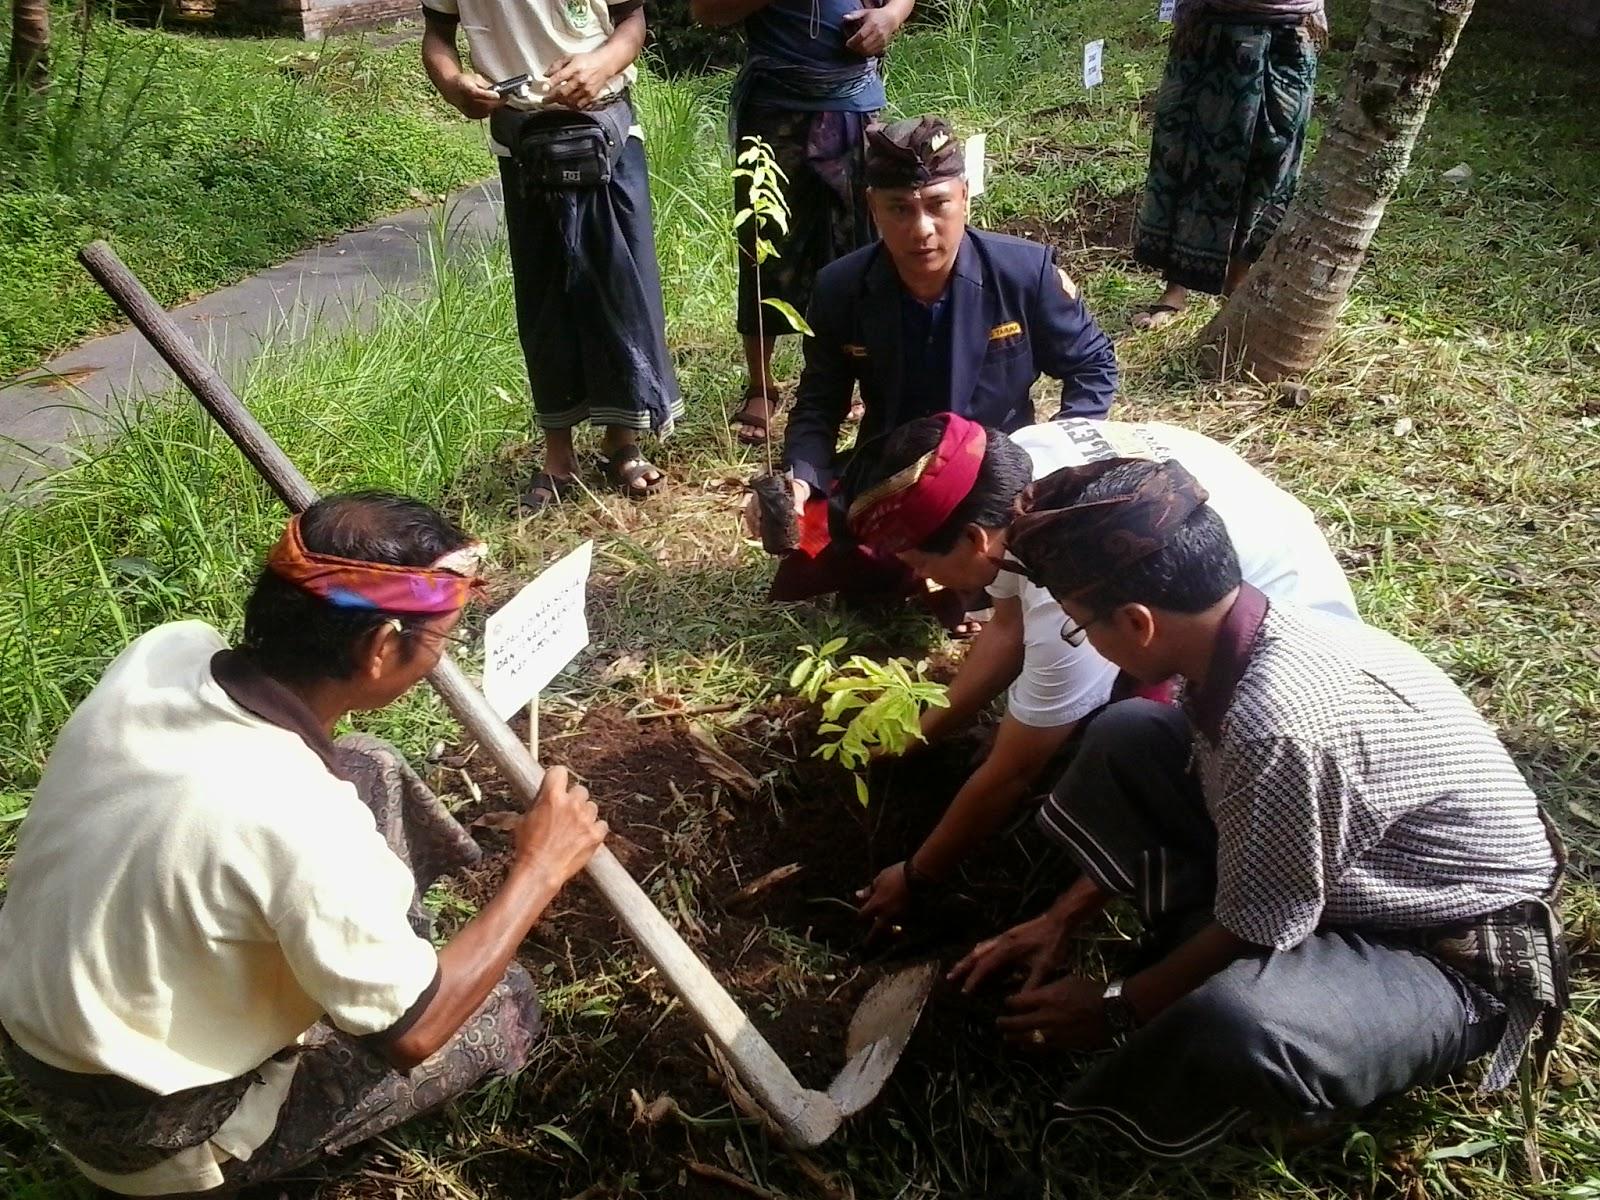 Kabid Binsos Disosnaker Kab. Badung sedang menanam pohon didampingi Ketua Karang Taruna Kab. Badung dan PSM Desa Pangsan